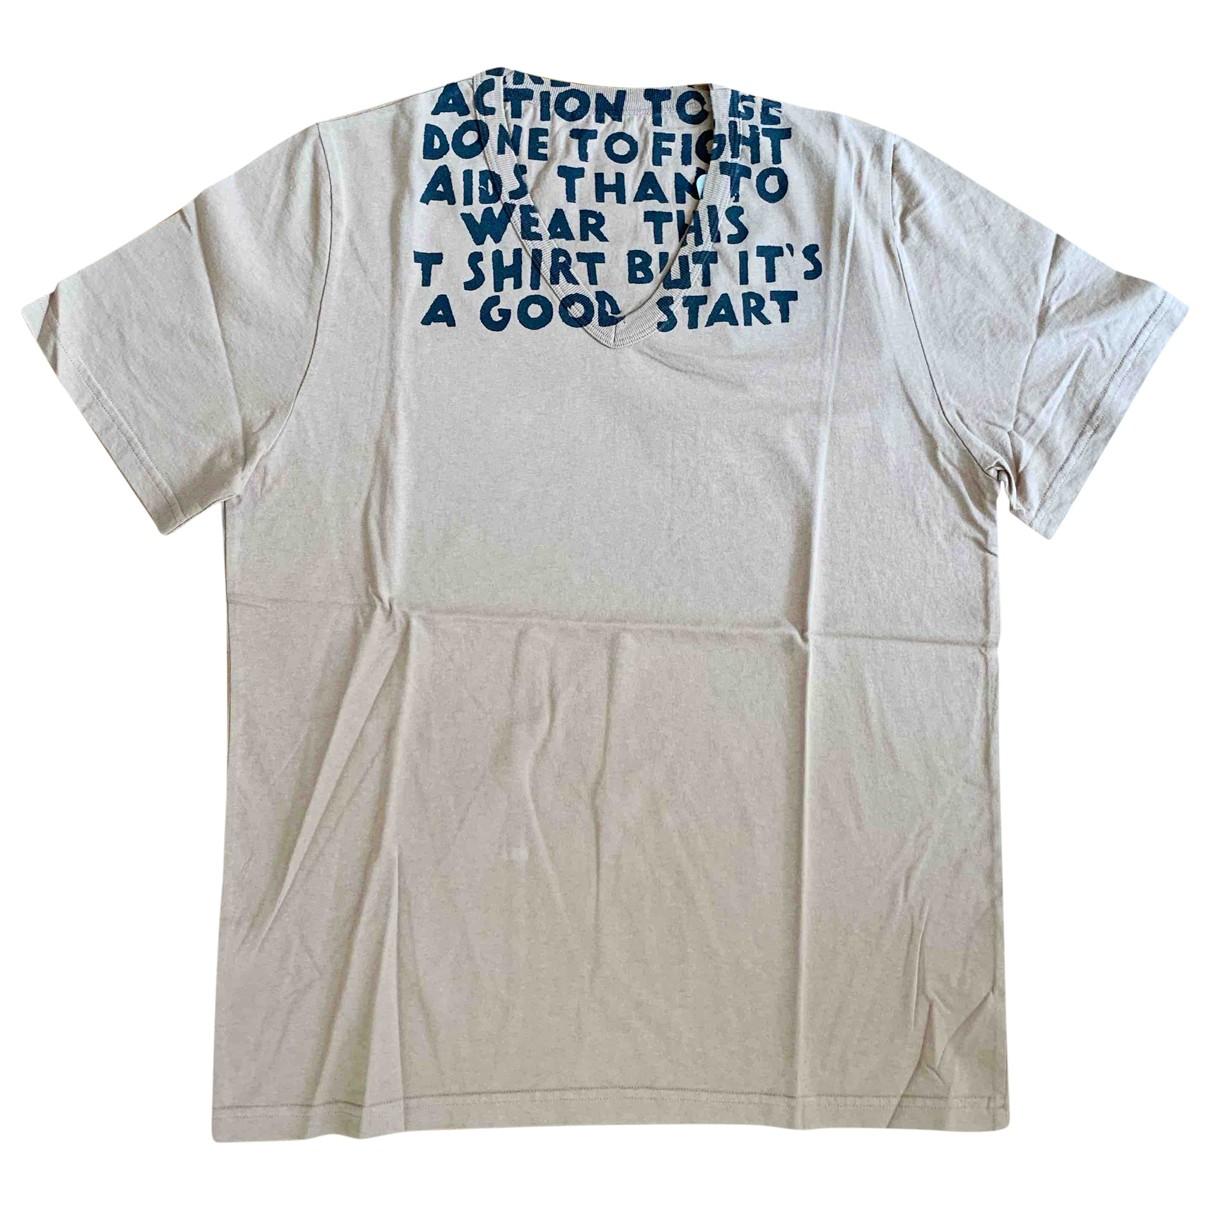 Maison Martin Margiela - Tee shirts   pour homme en coton - marron